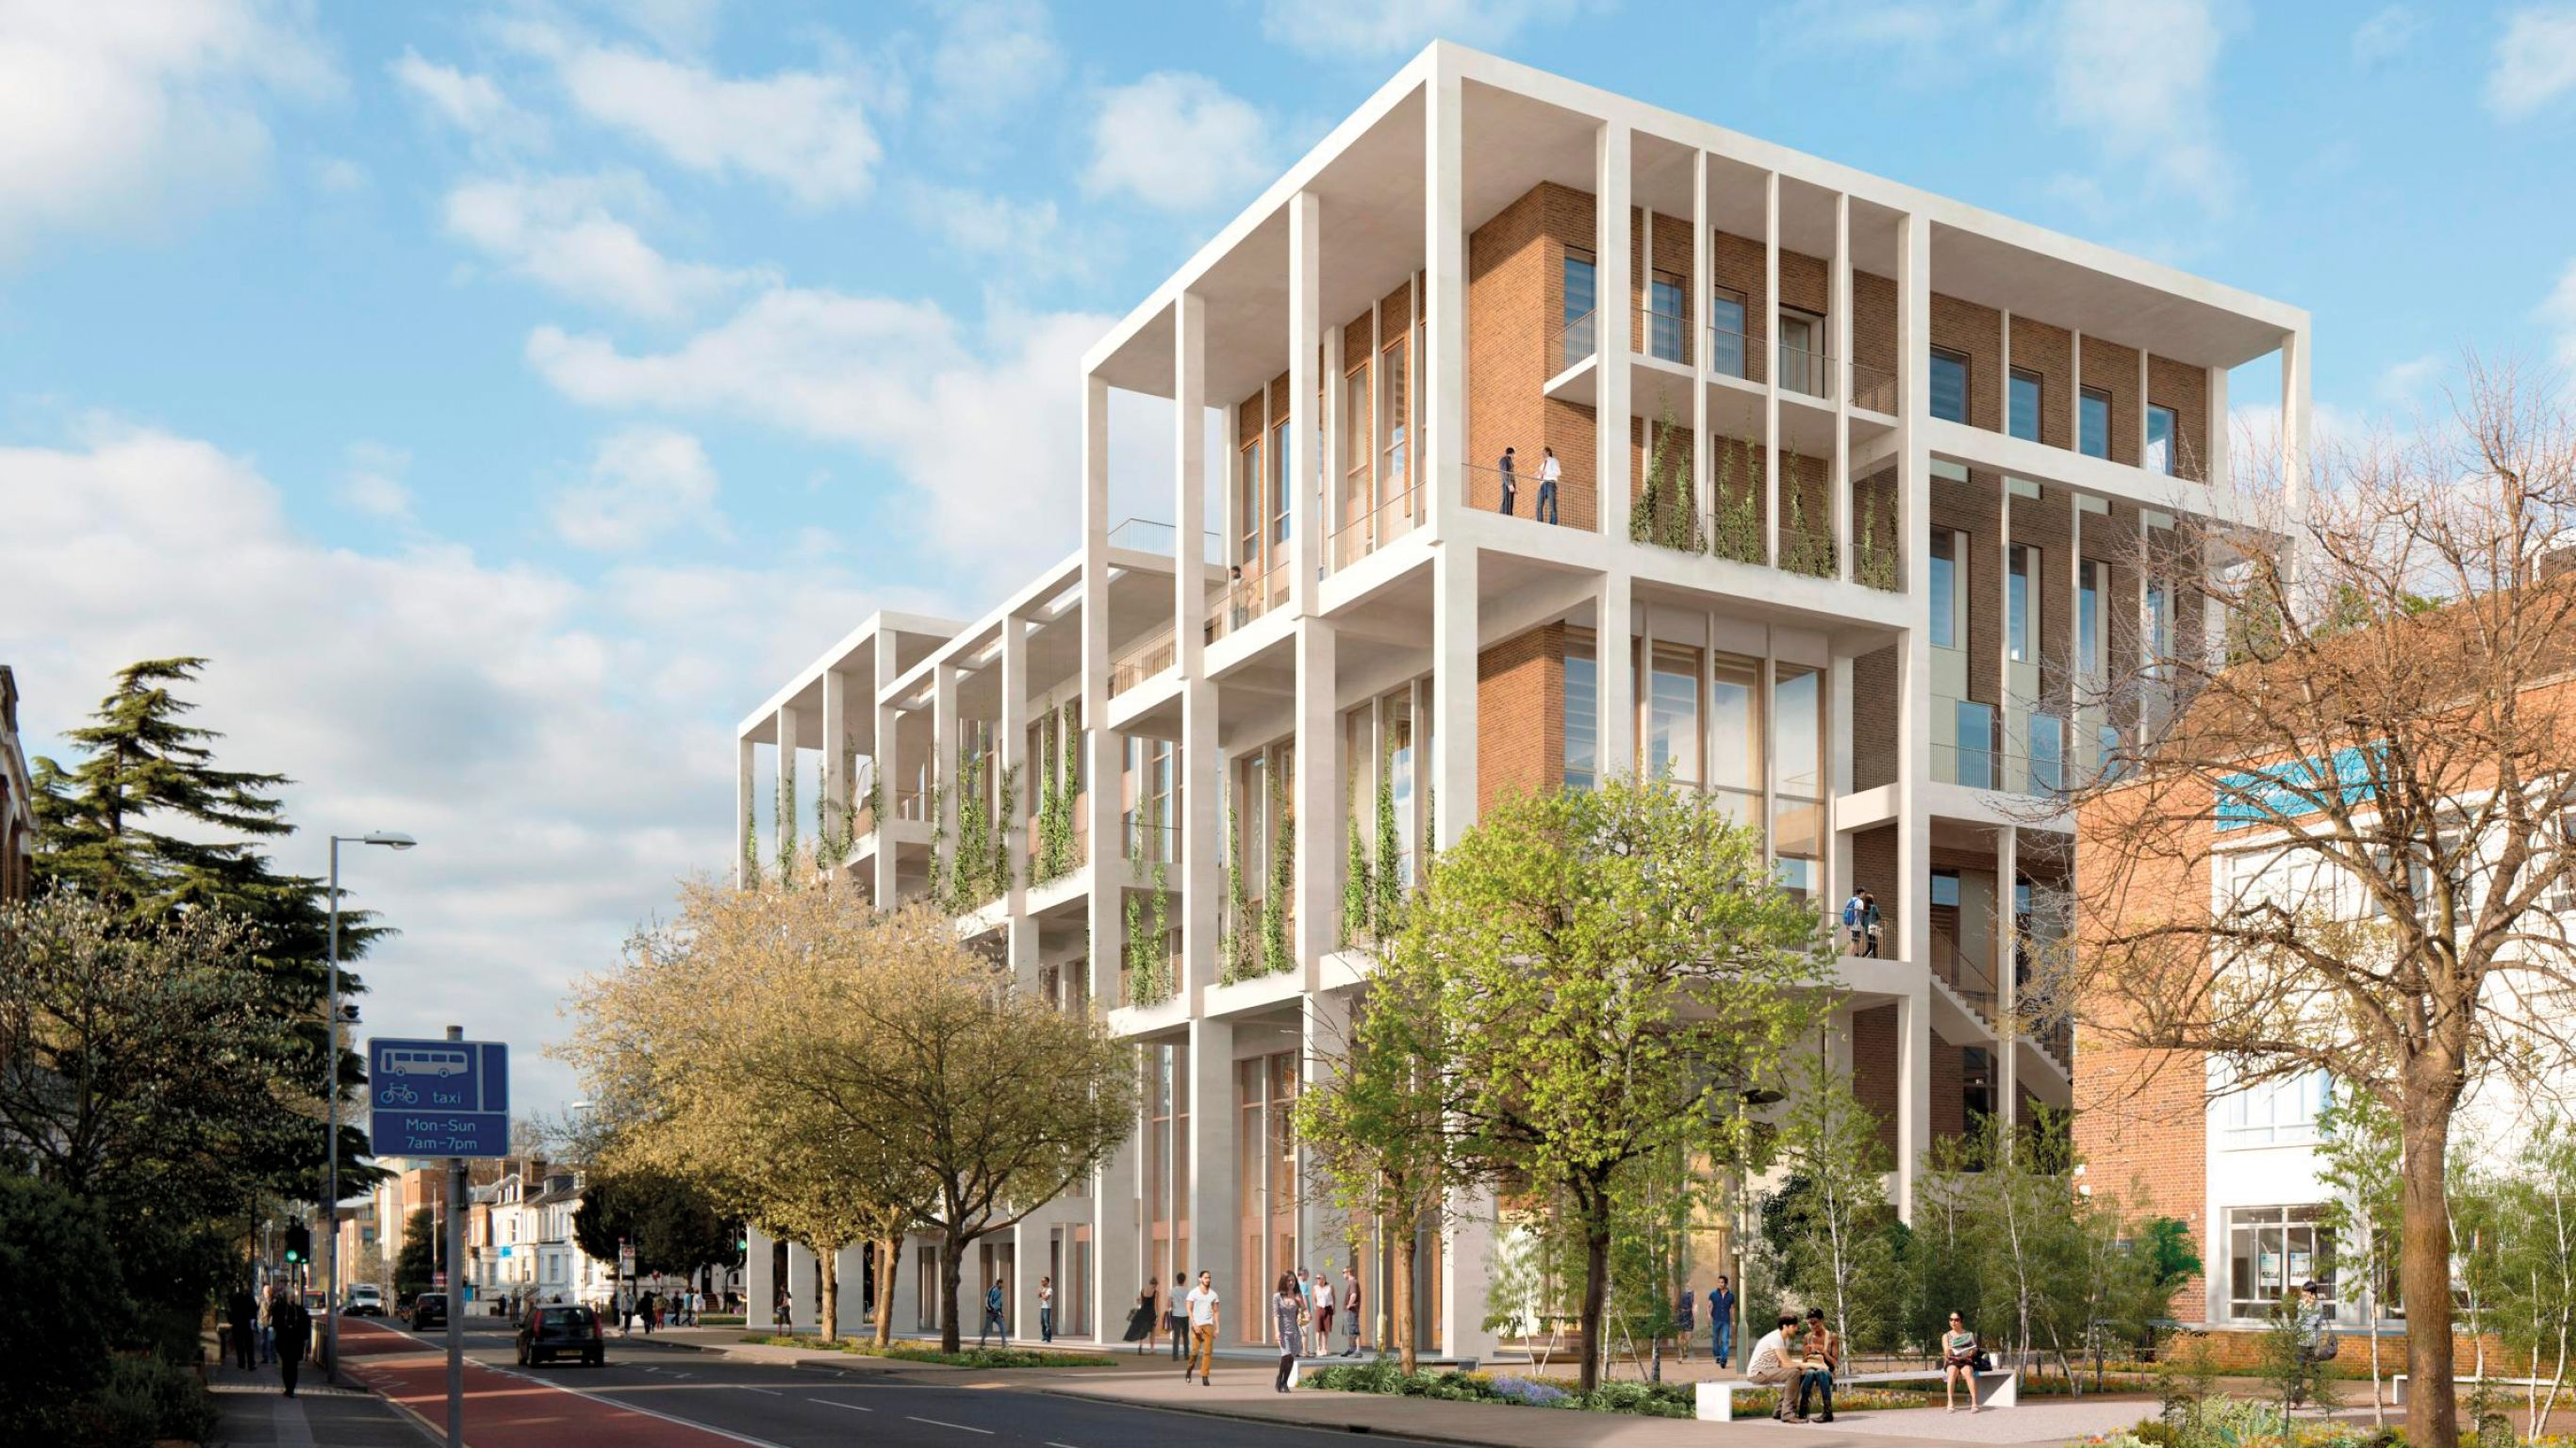 Kingston University Town House wins RIBA Stirling Prize 2021